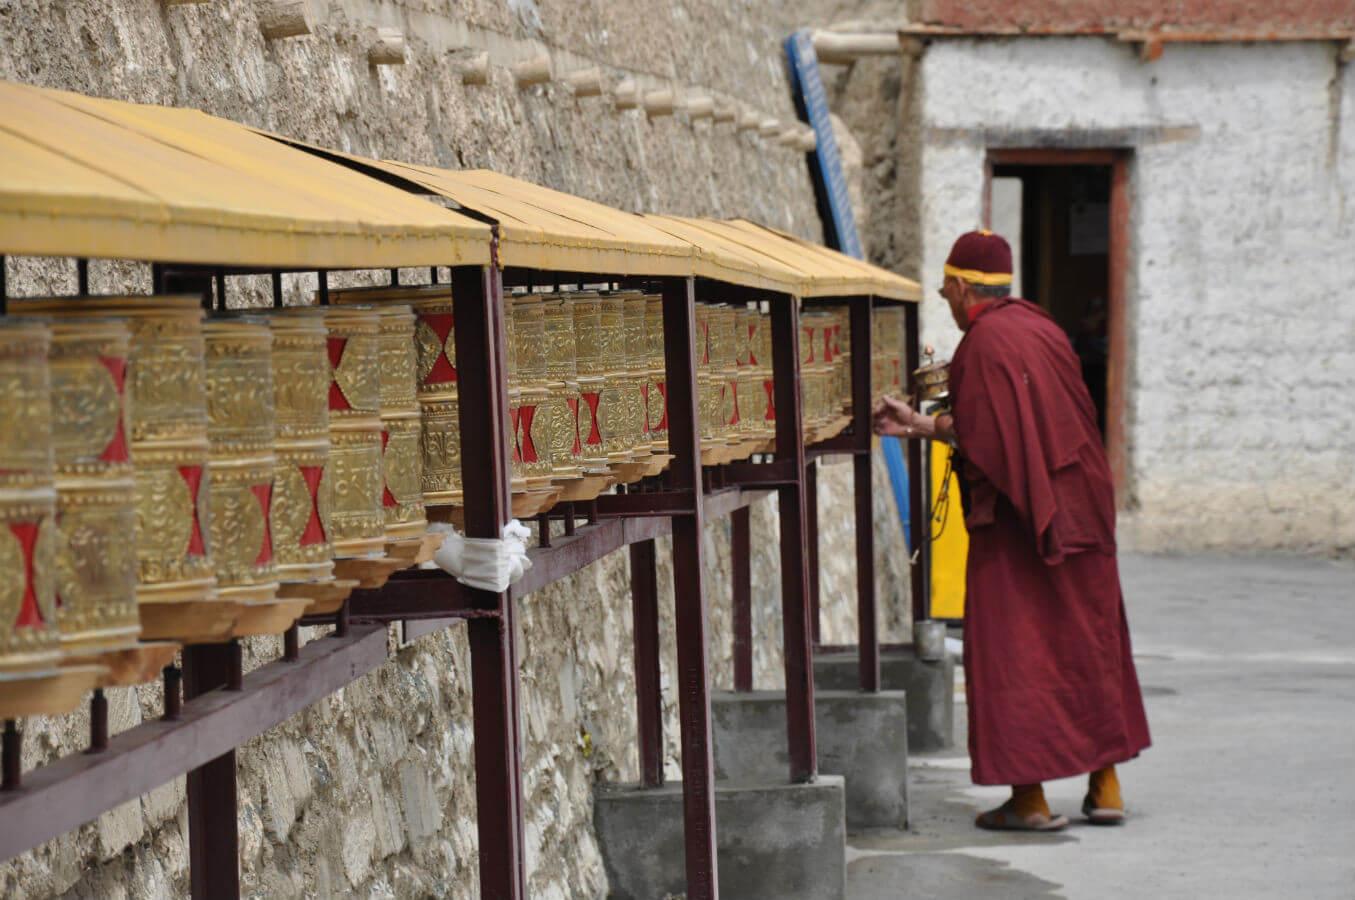 kloster lamayuru tibet indien